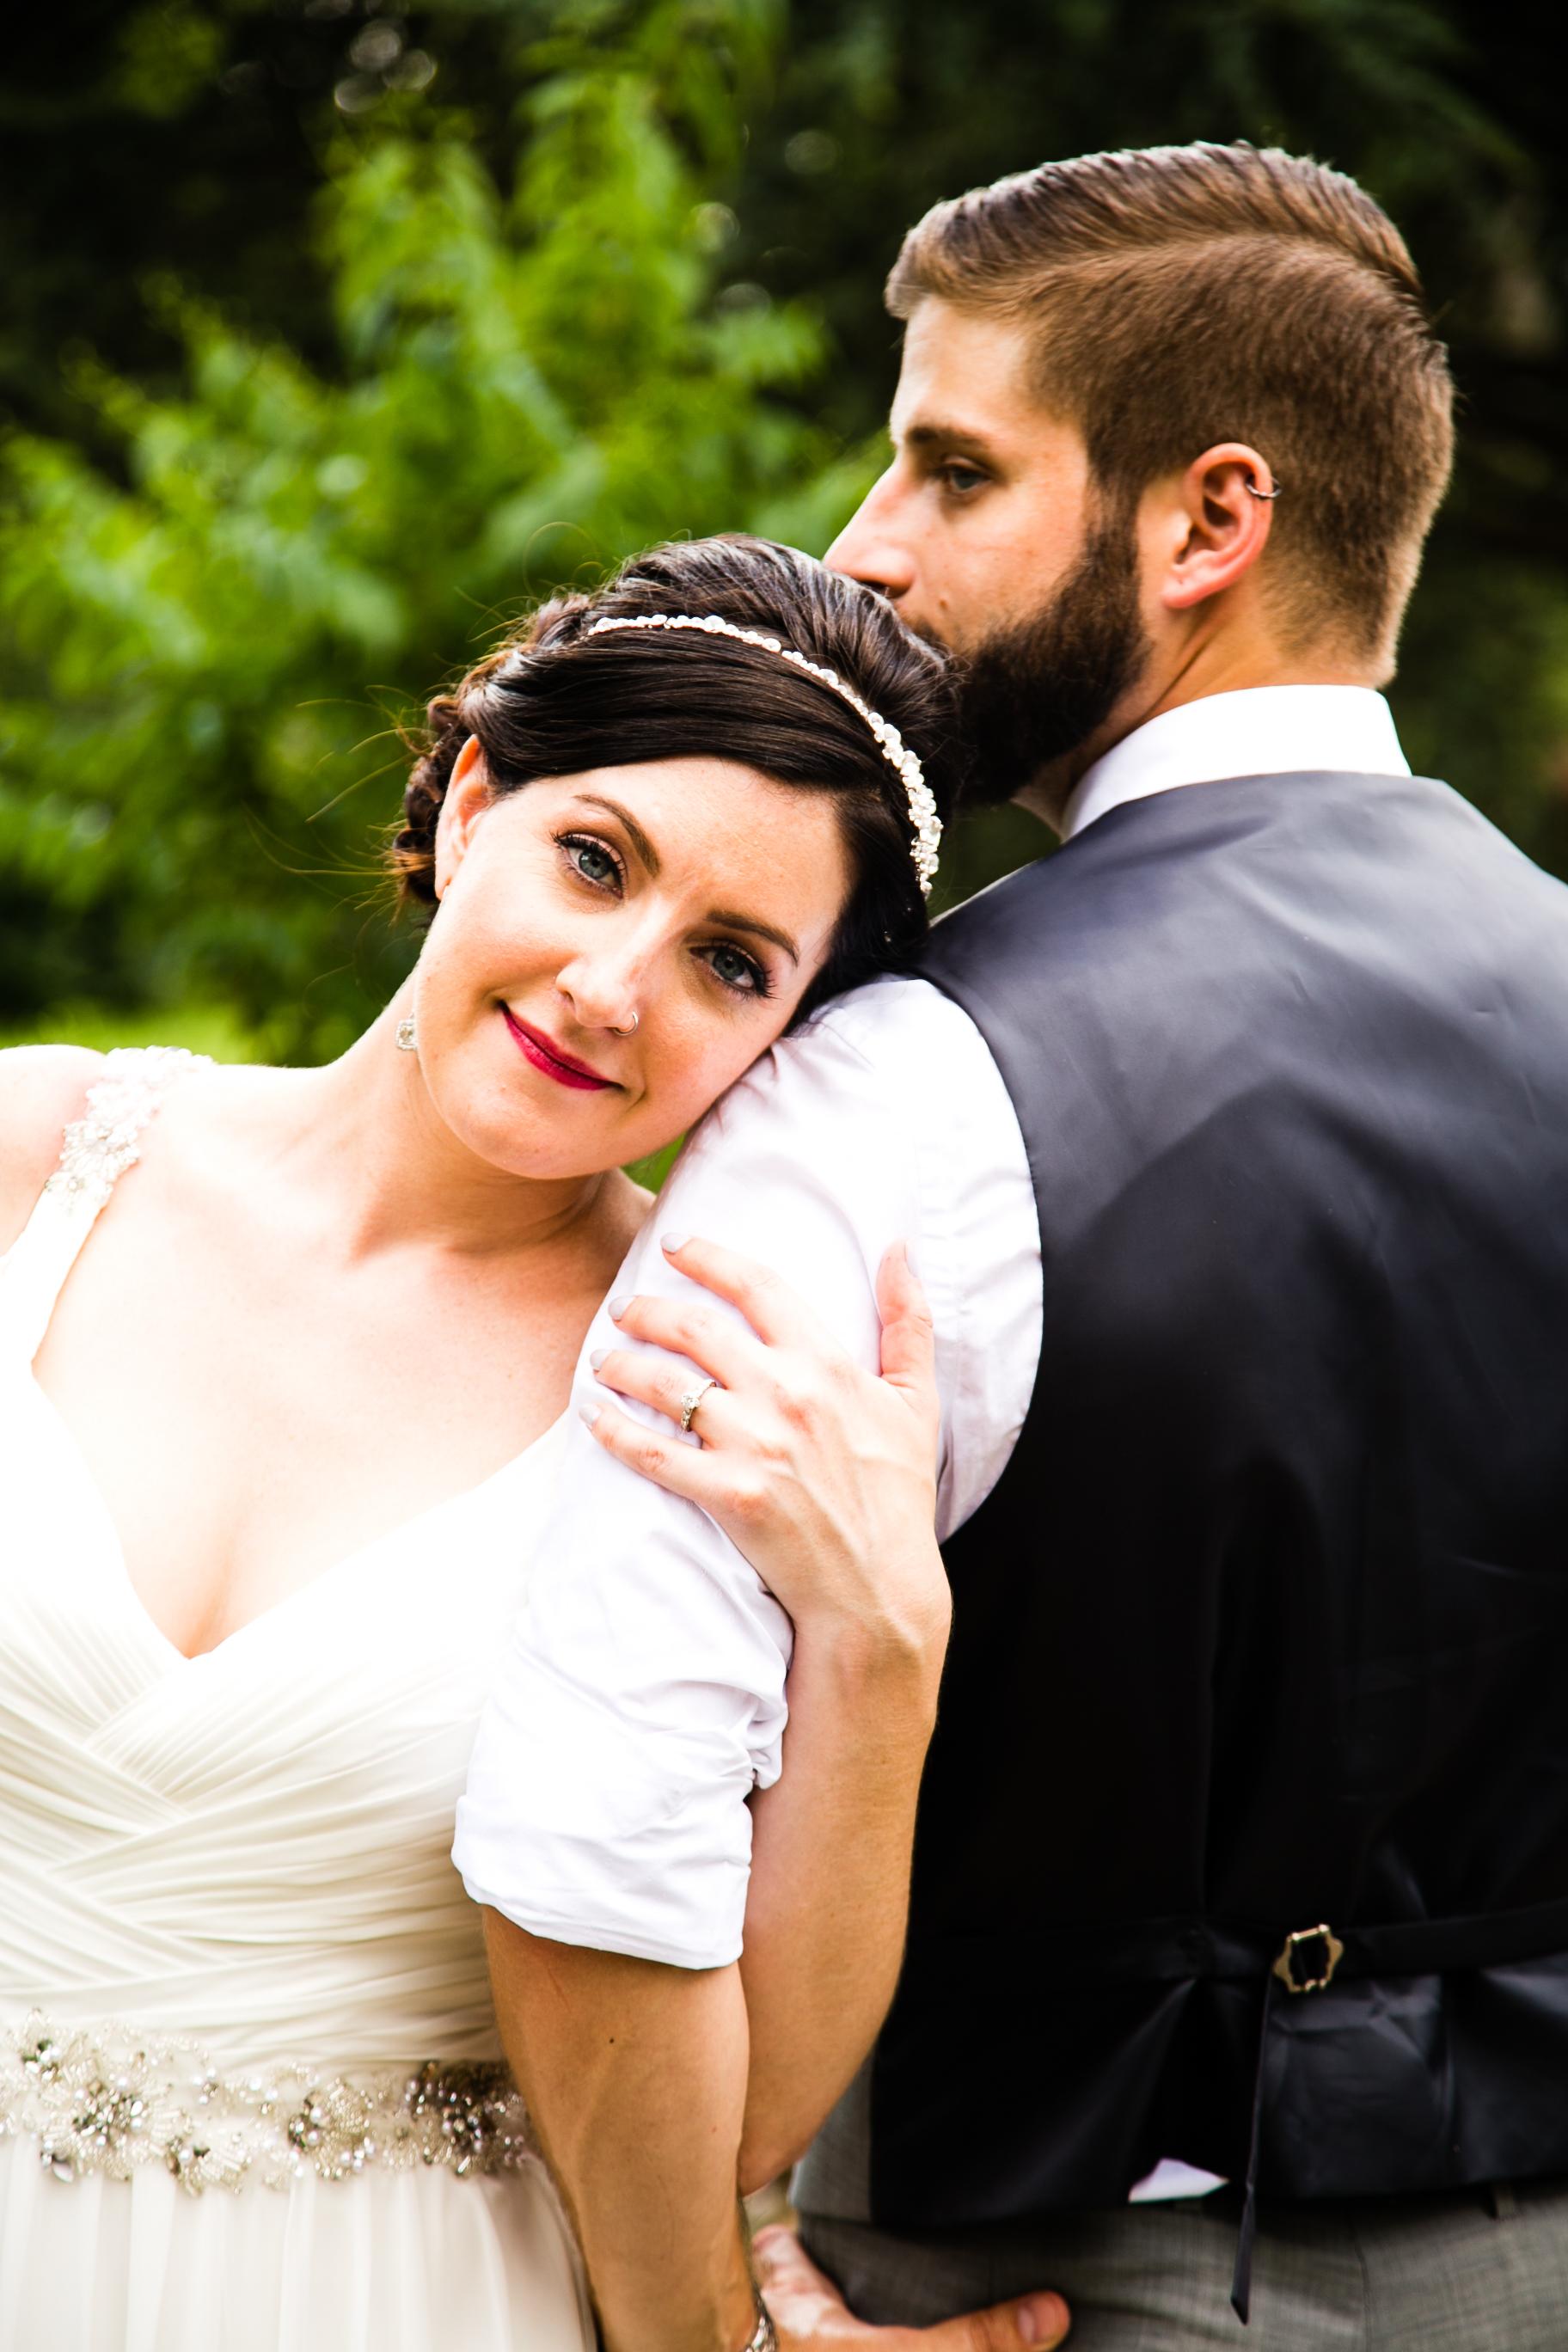 TYLER ARBORETUM WEDDING PHOTOGRAPHY LOVESTRUCK PICTURES-034.jpg